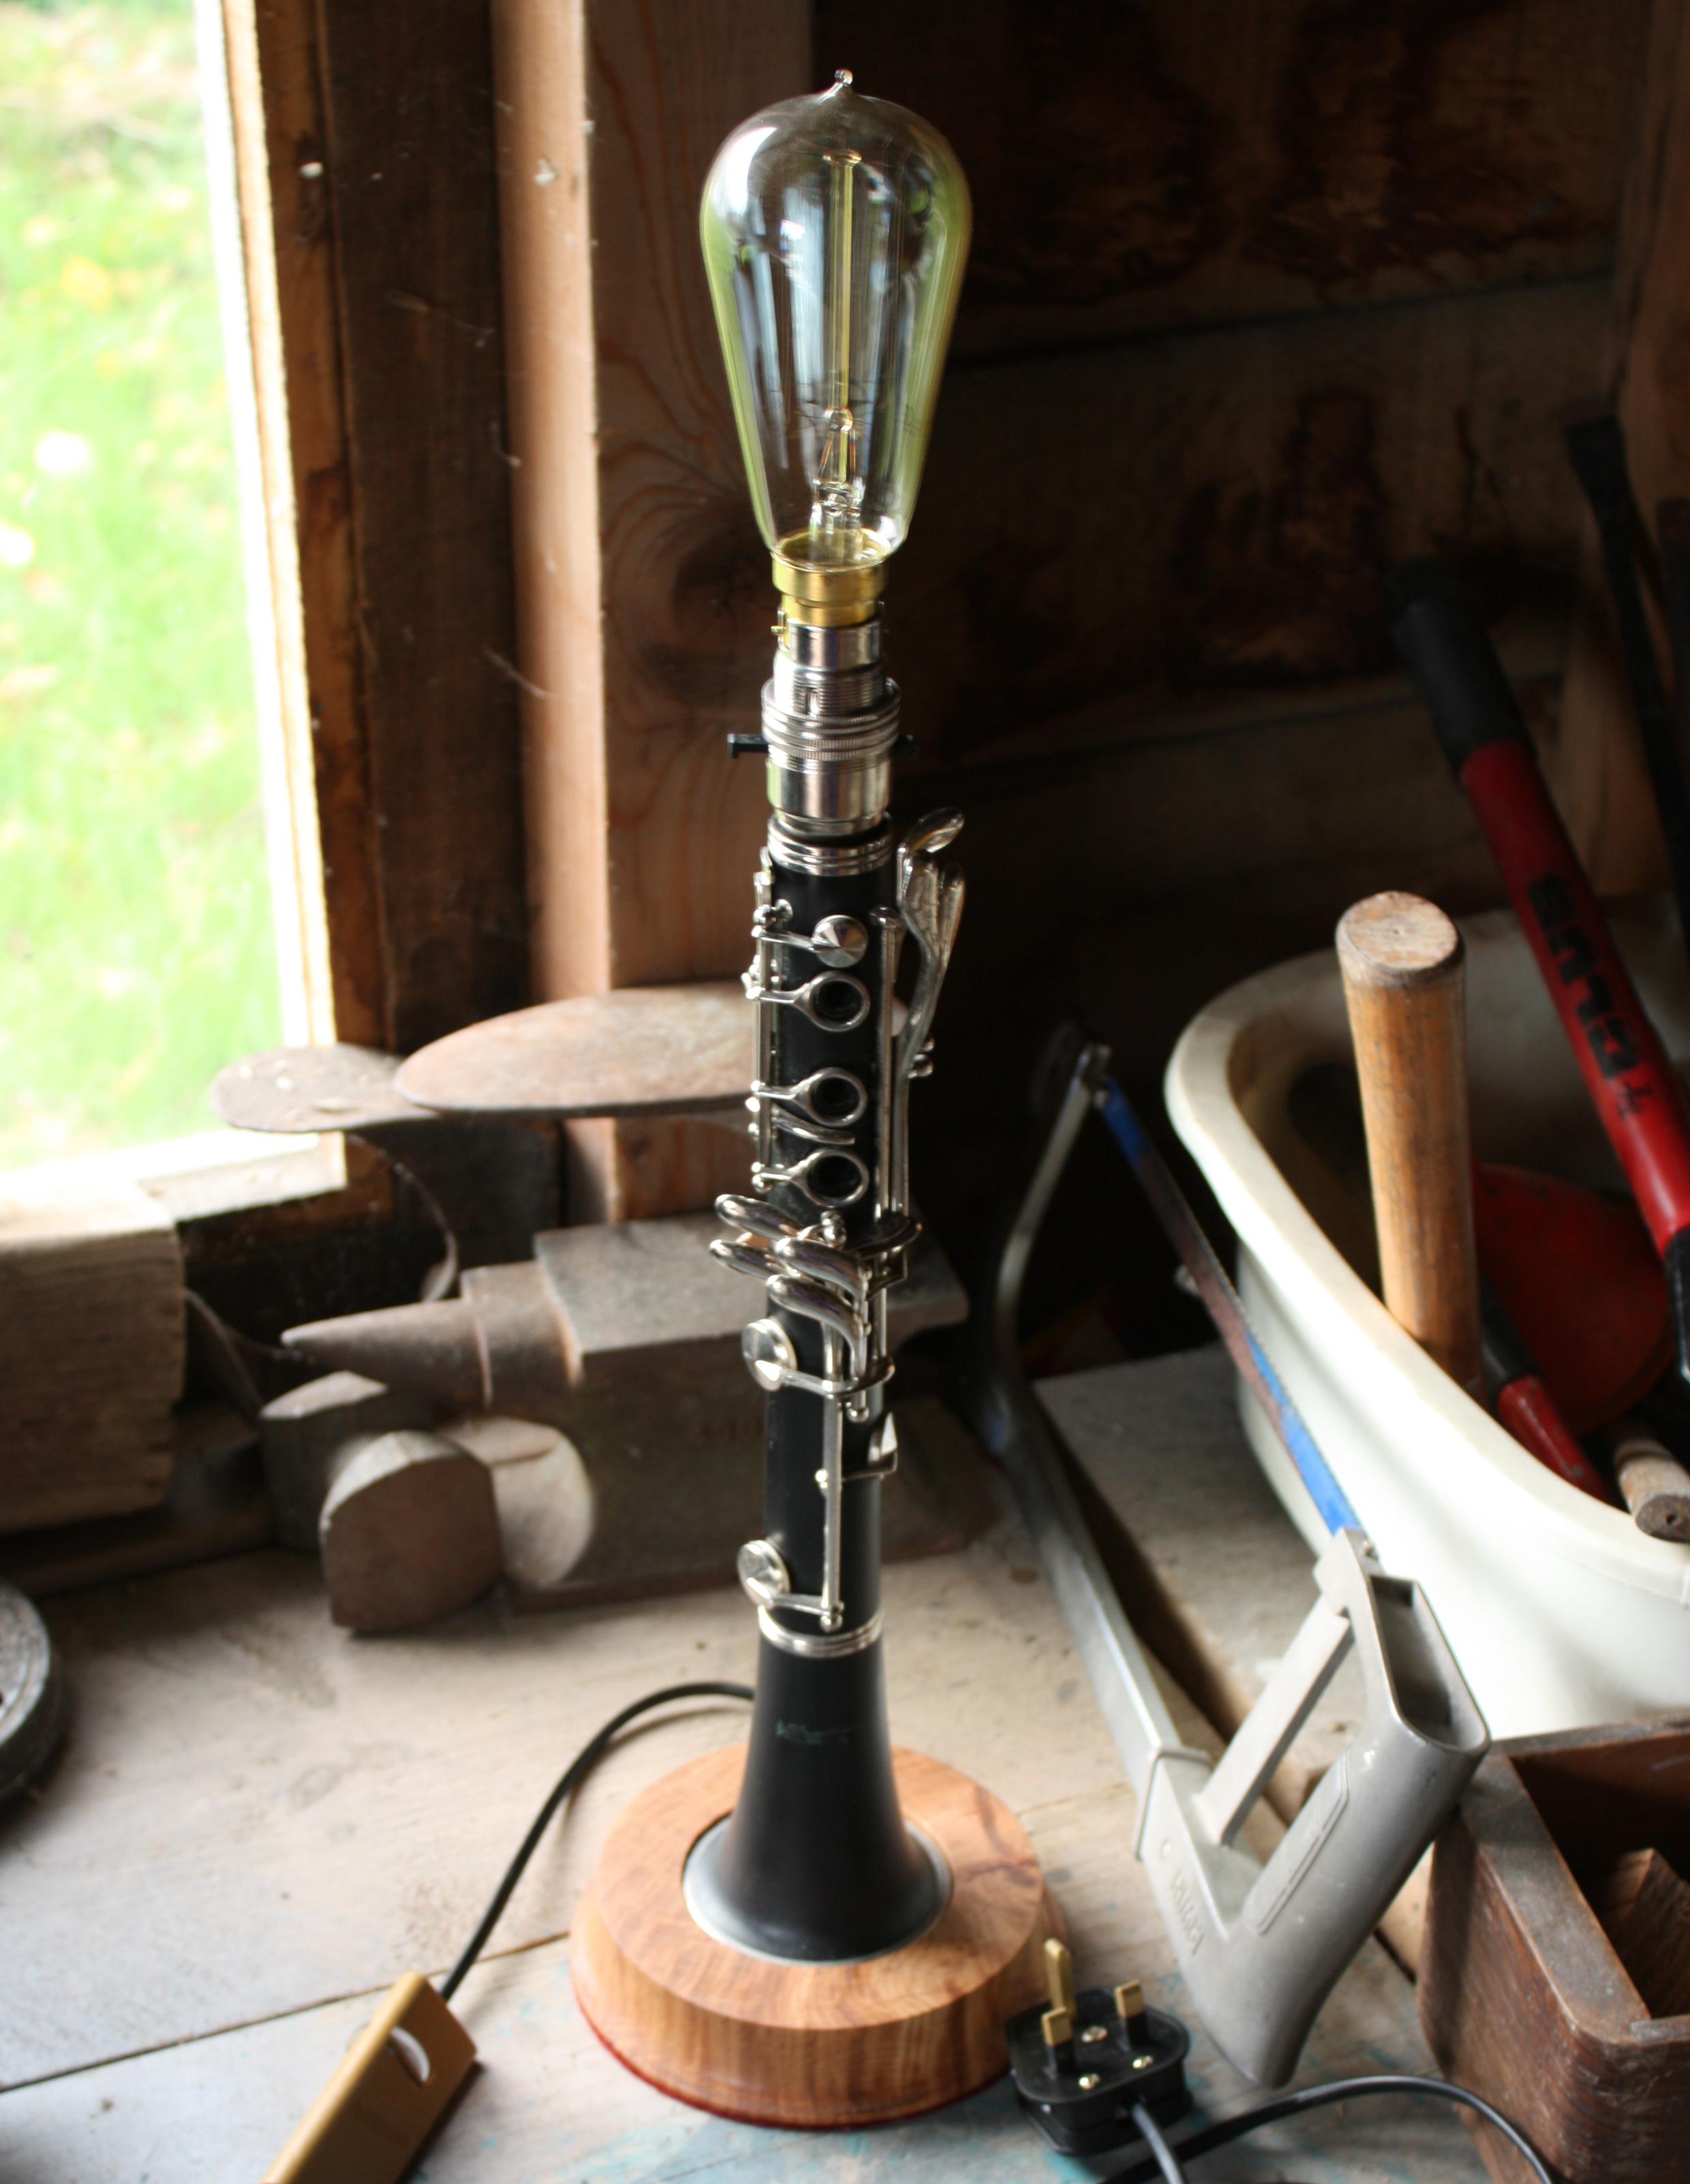 clarinet+lamp+3+rebecca+howson+crane+away